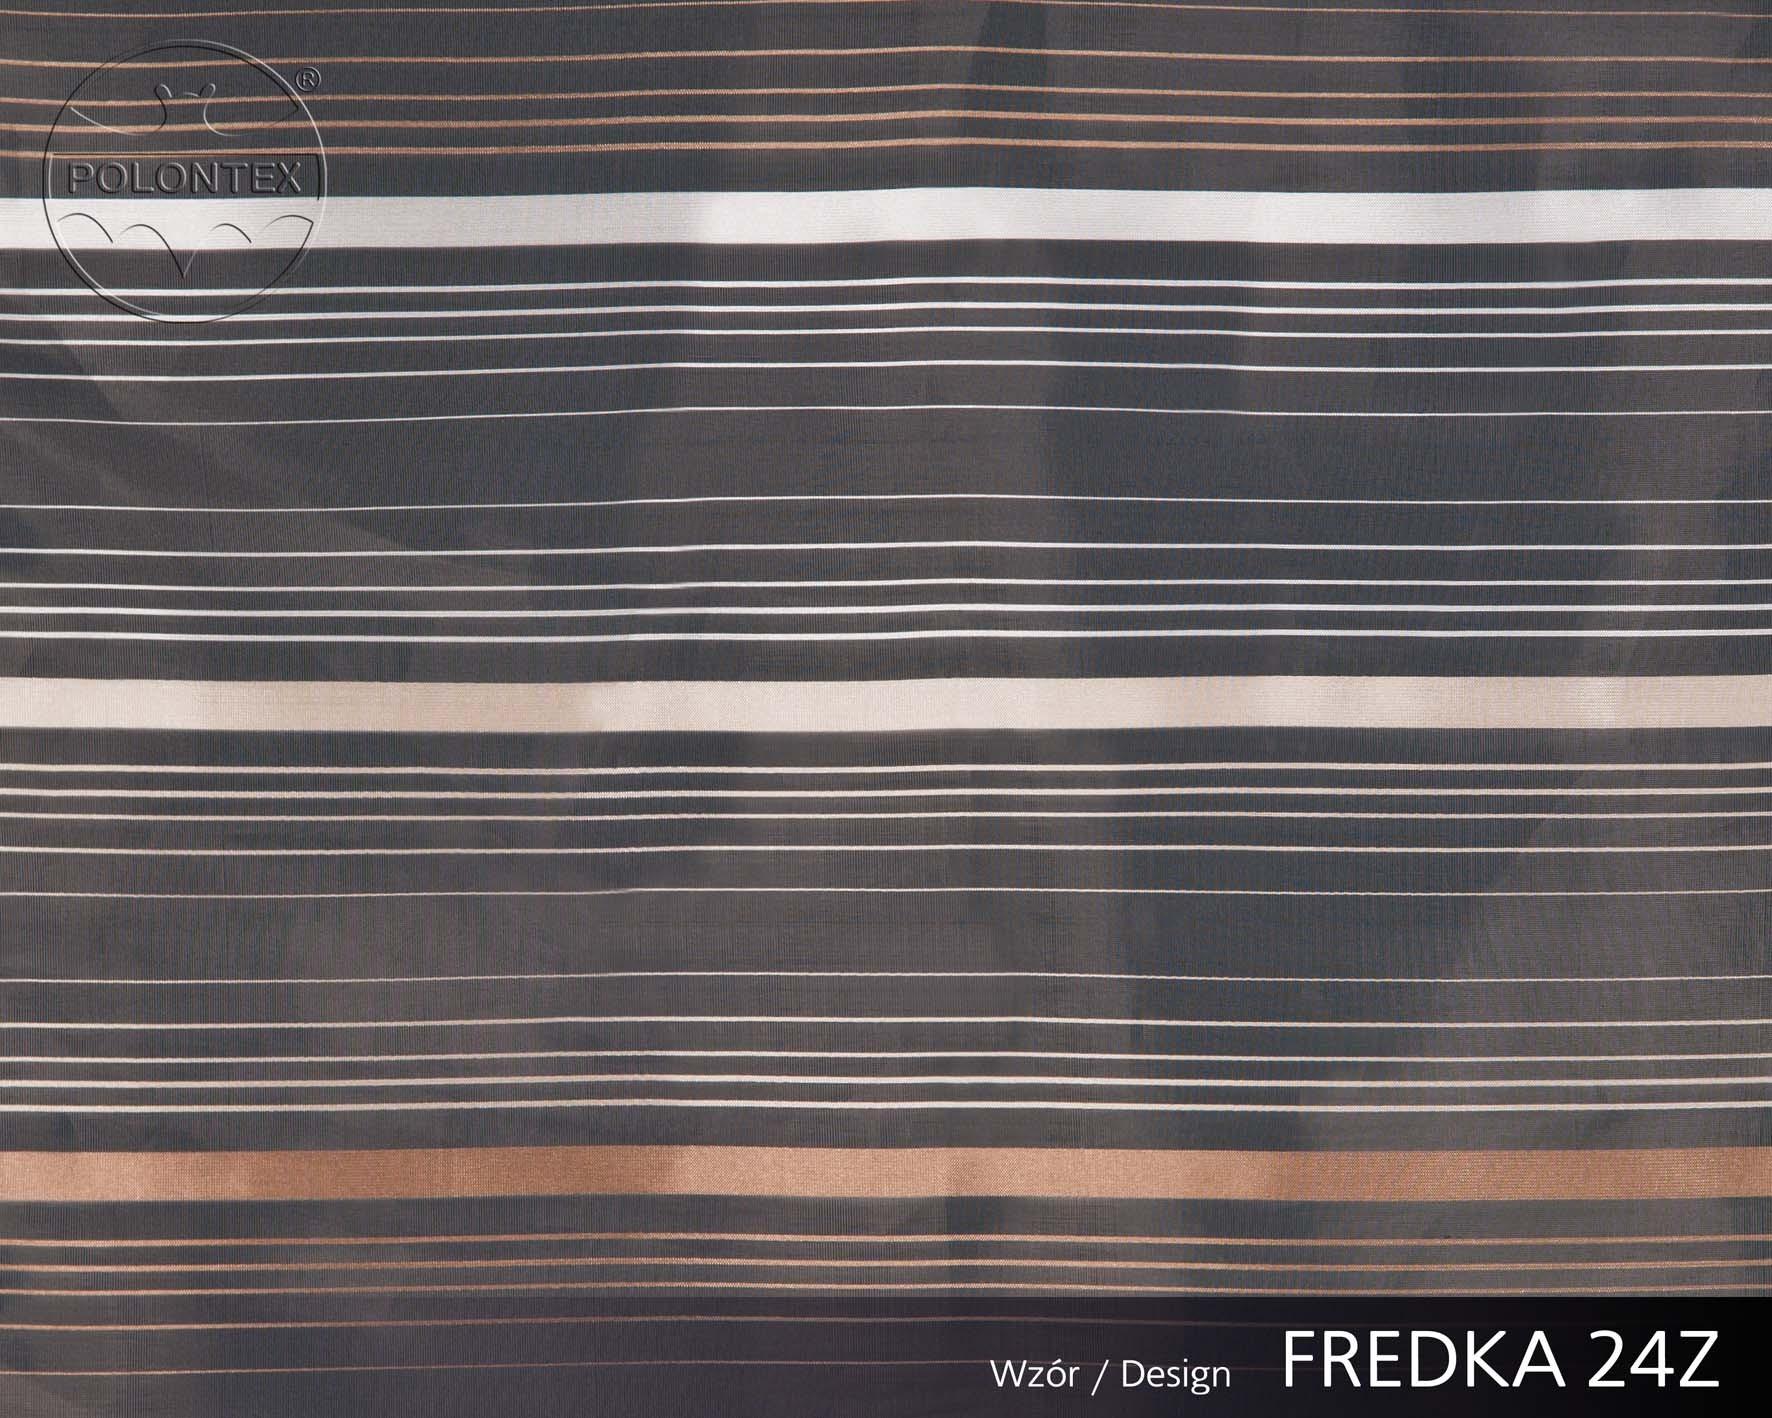 FREDKA 24Z